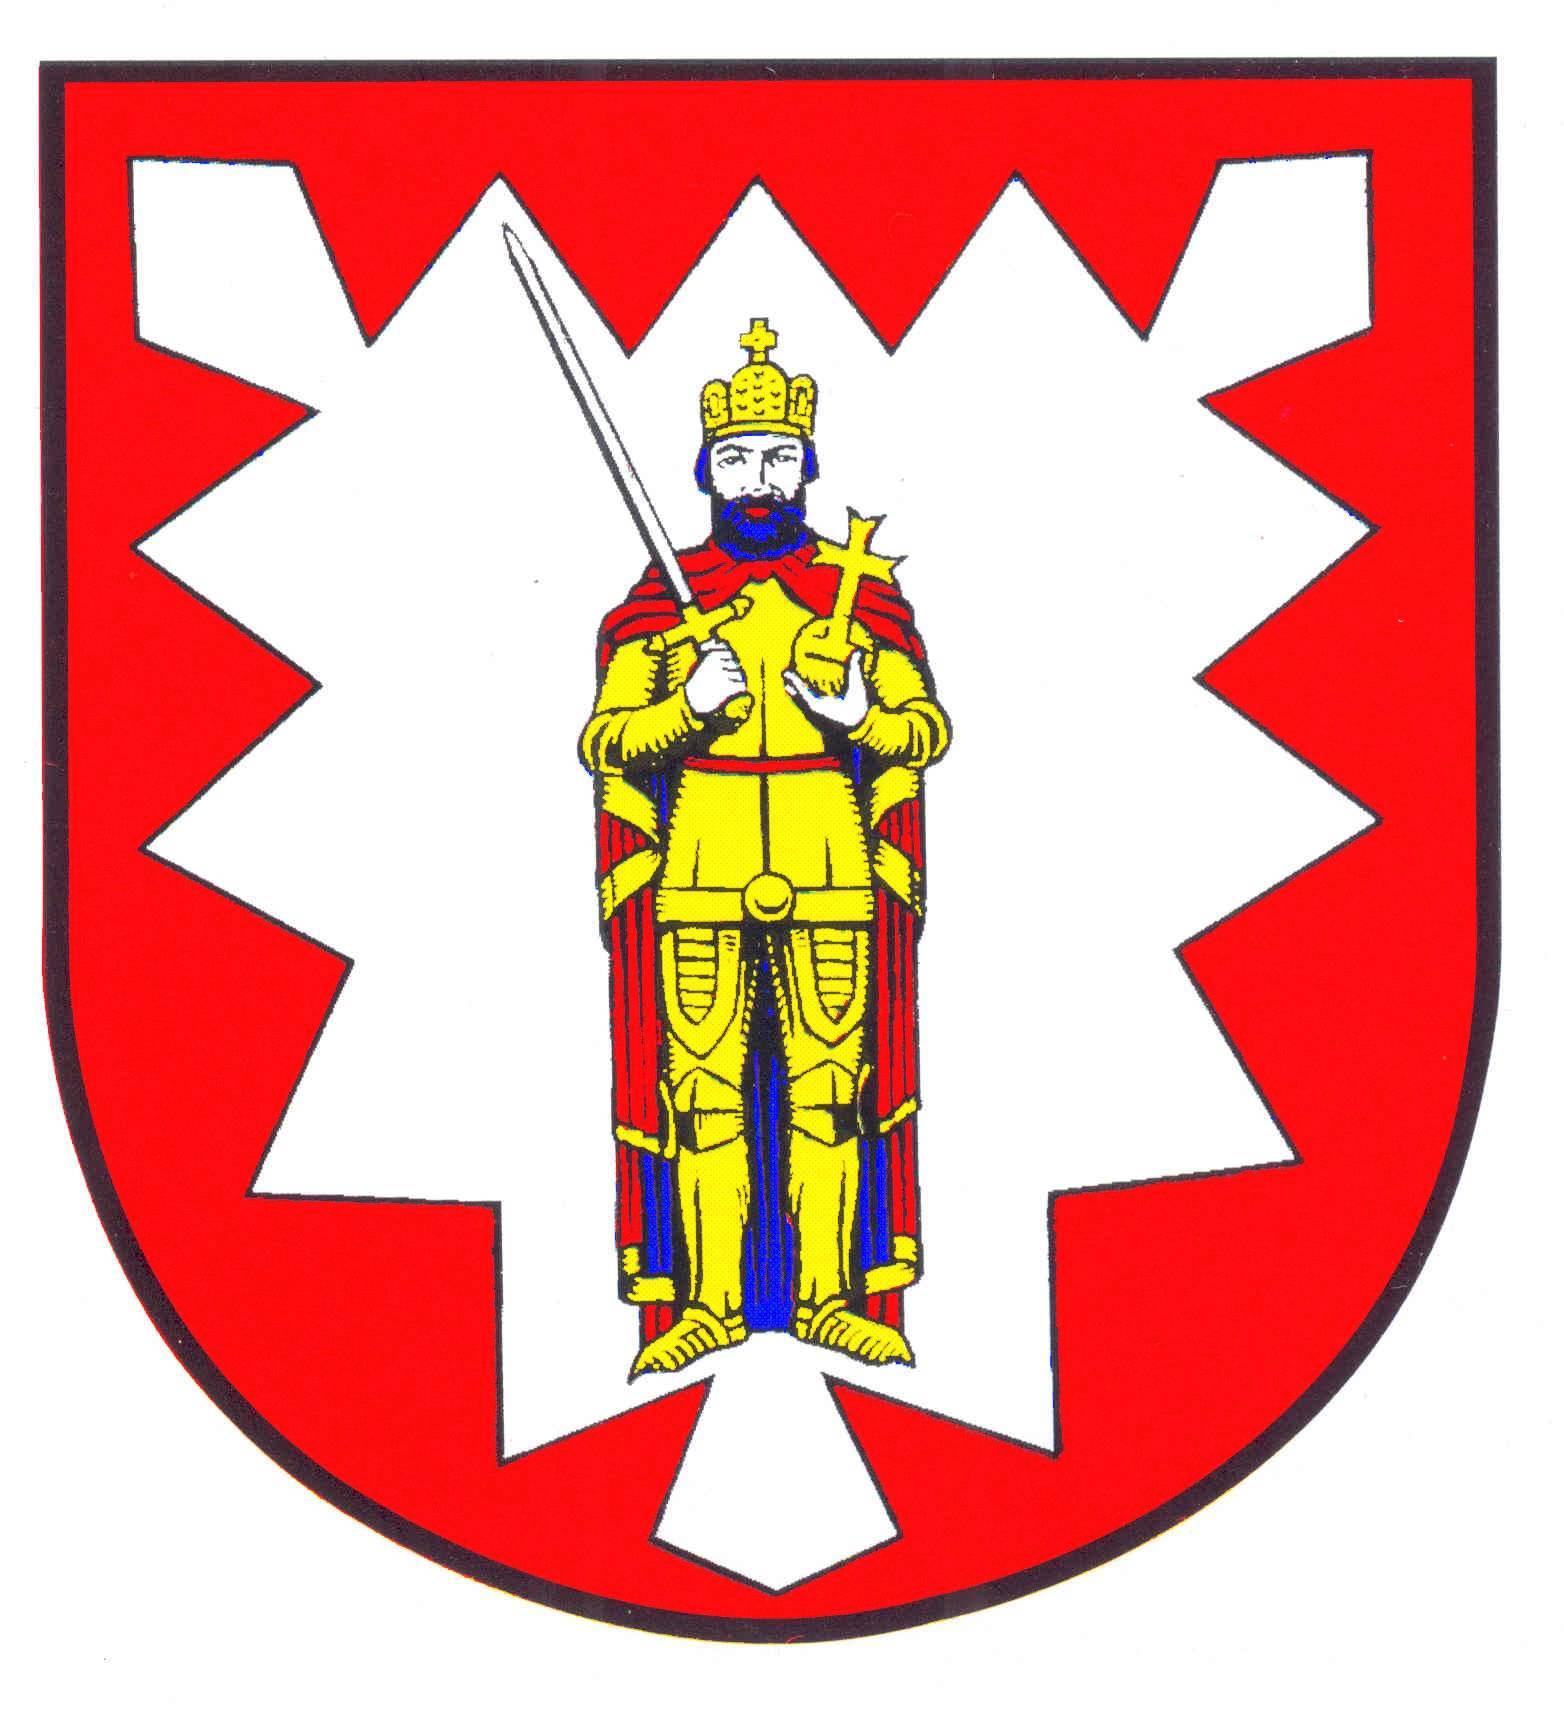 Wappen StadtWedel, Kreis Pinneberg